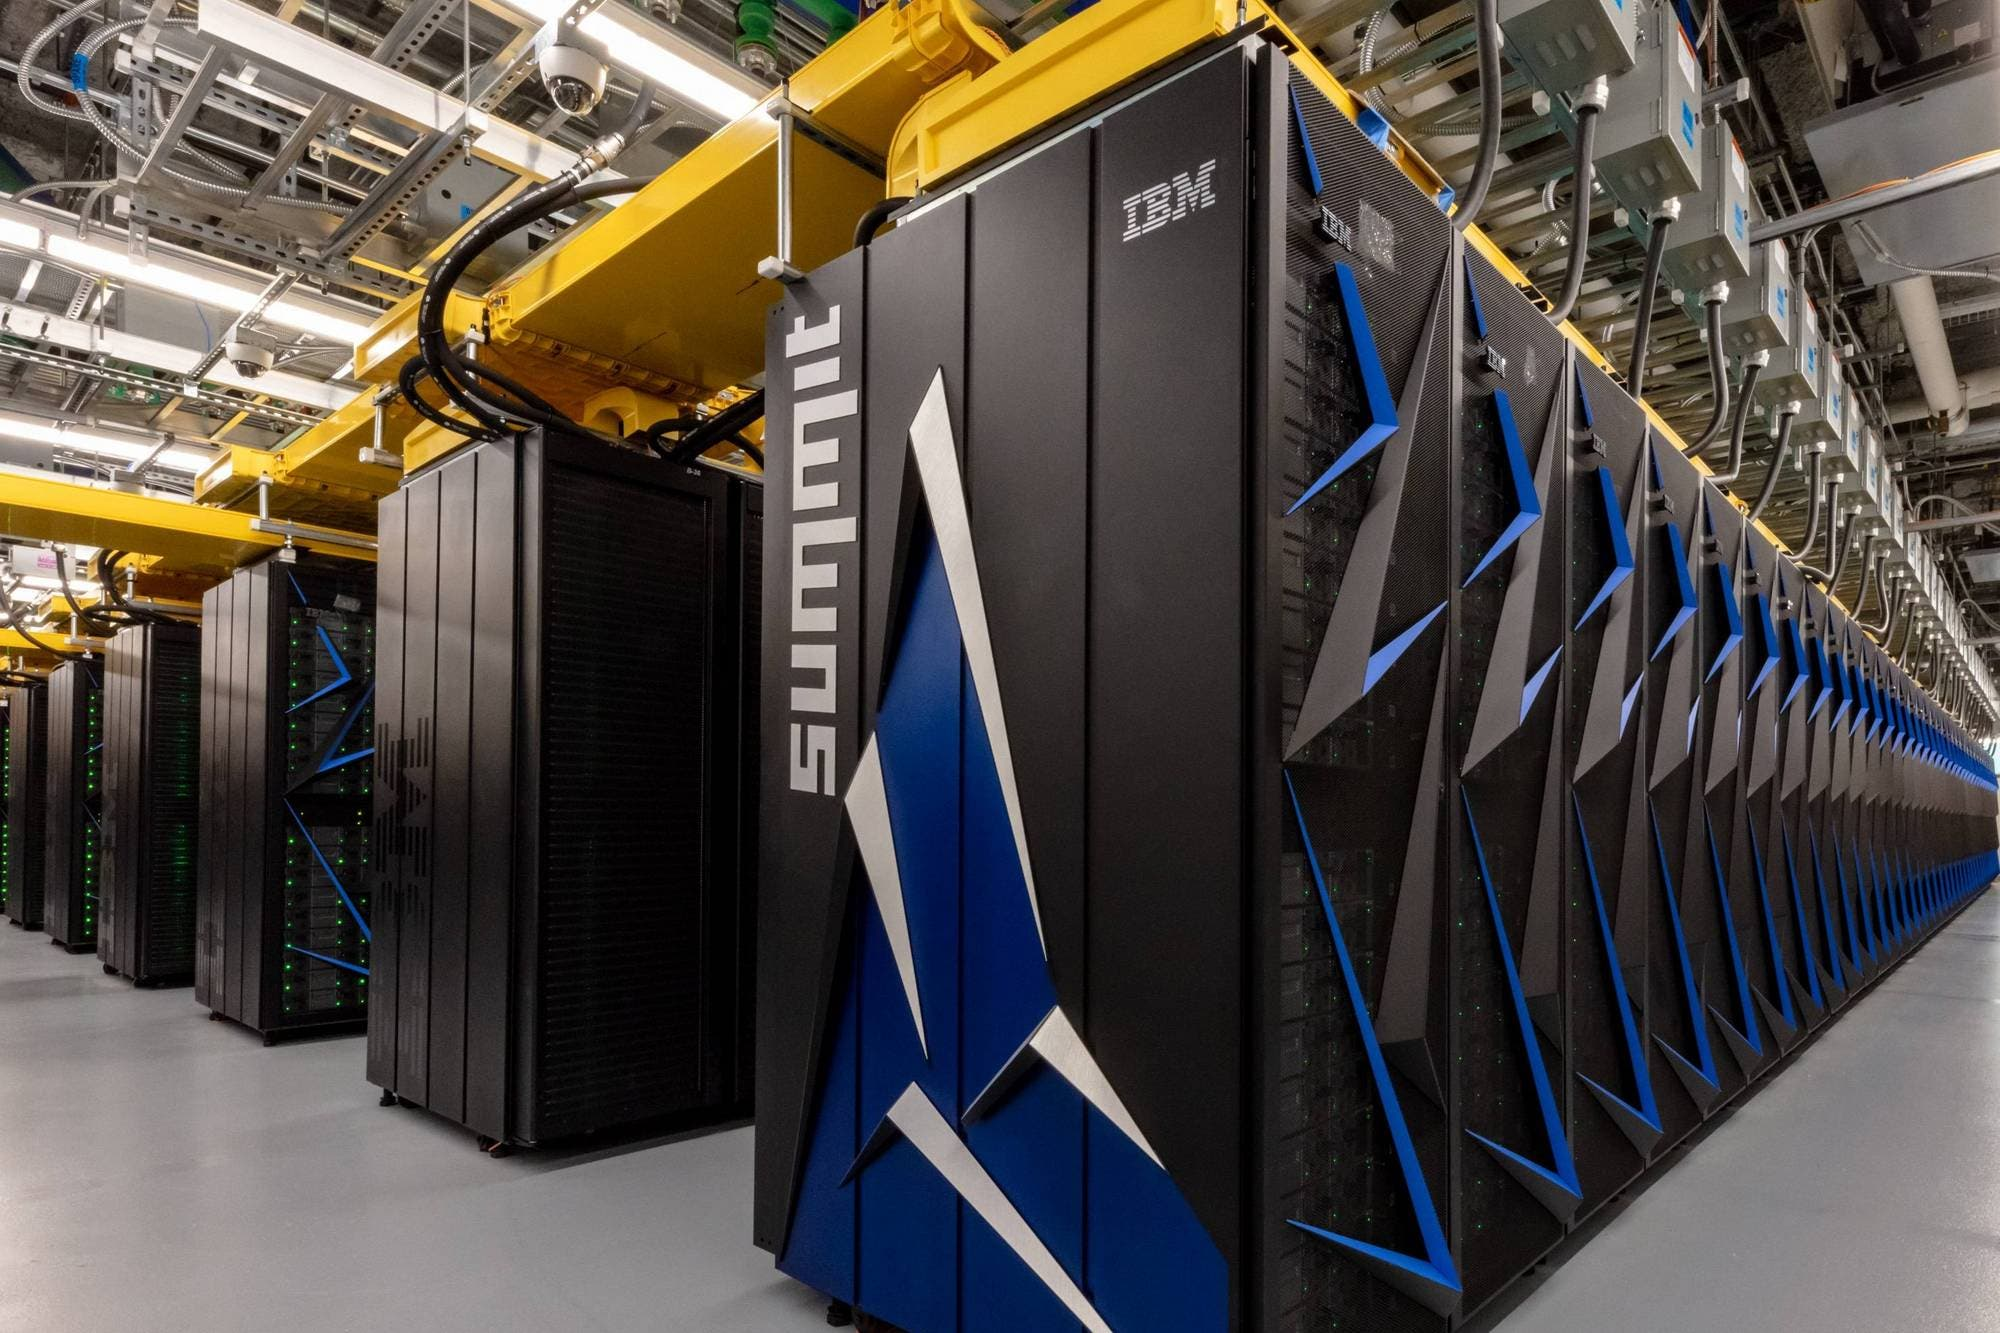 La supercomputadora Summit de IBM ya identificó 77 drogas para combatir el coronavirus